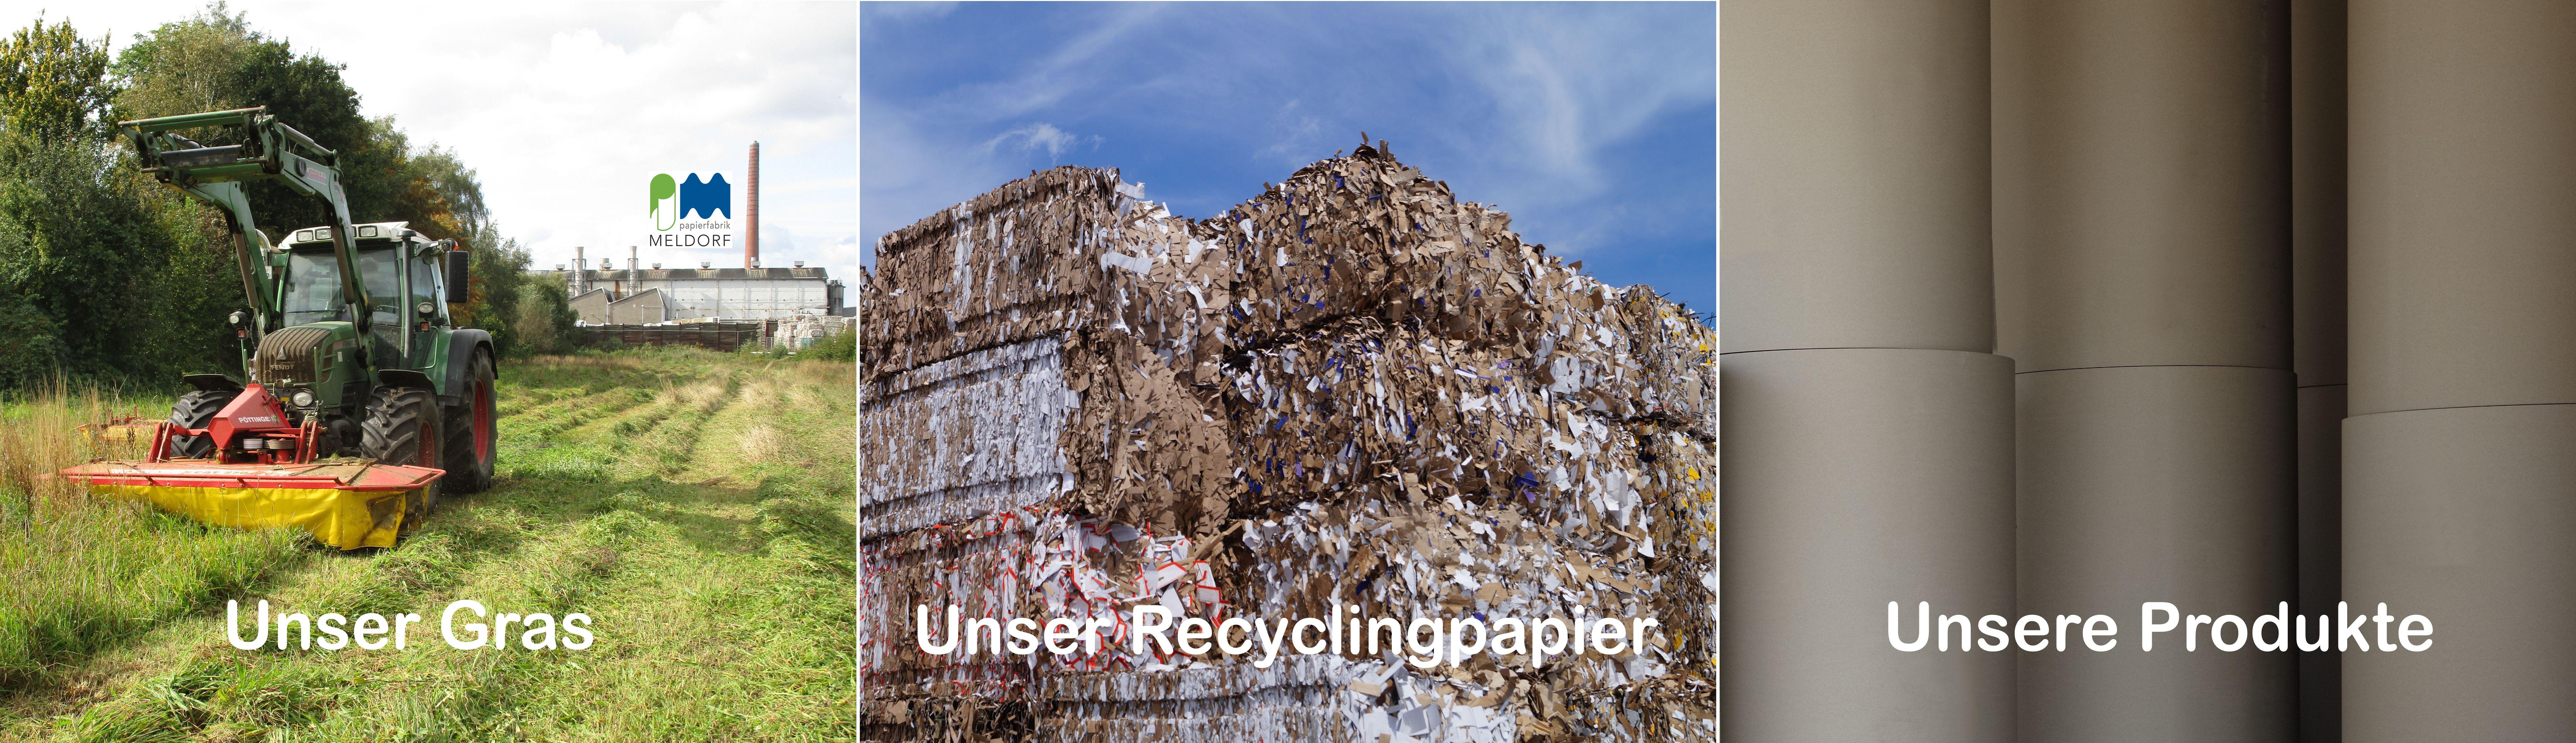 Header Unser Gras Unser Recyclingpapier Unsere produkte Papierfabrik Meldorf